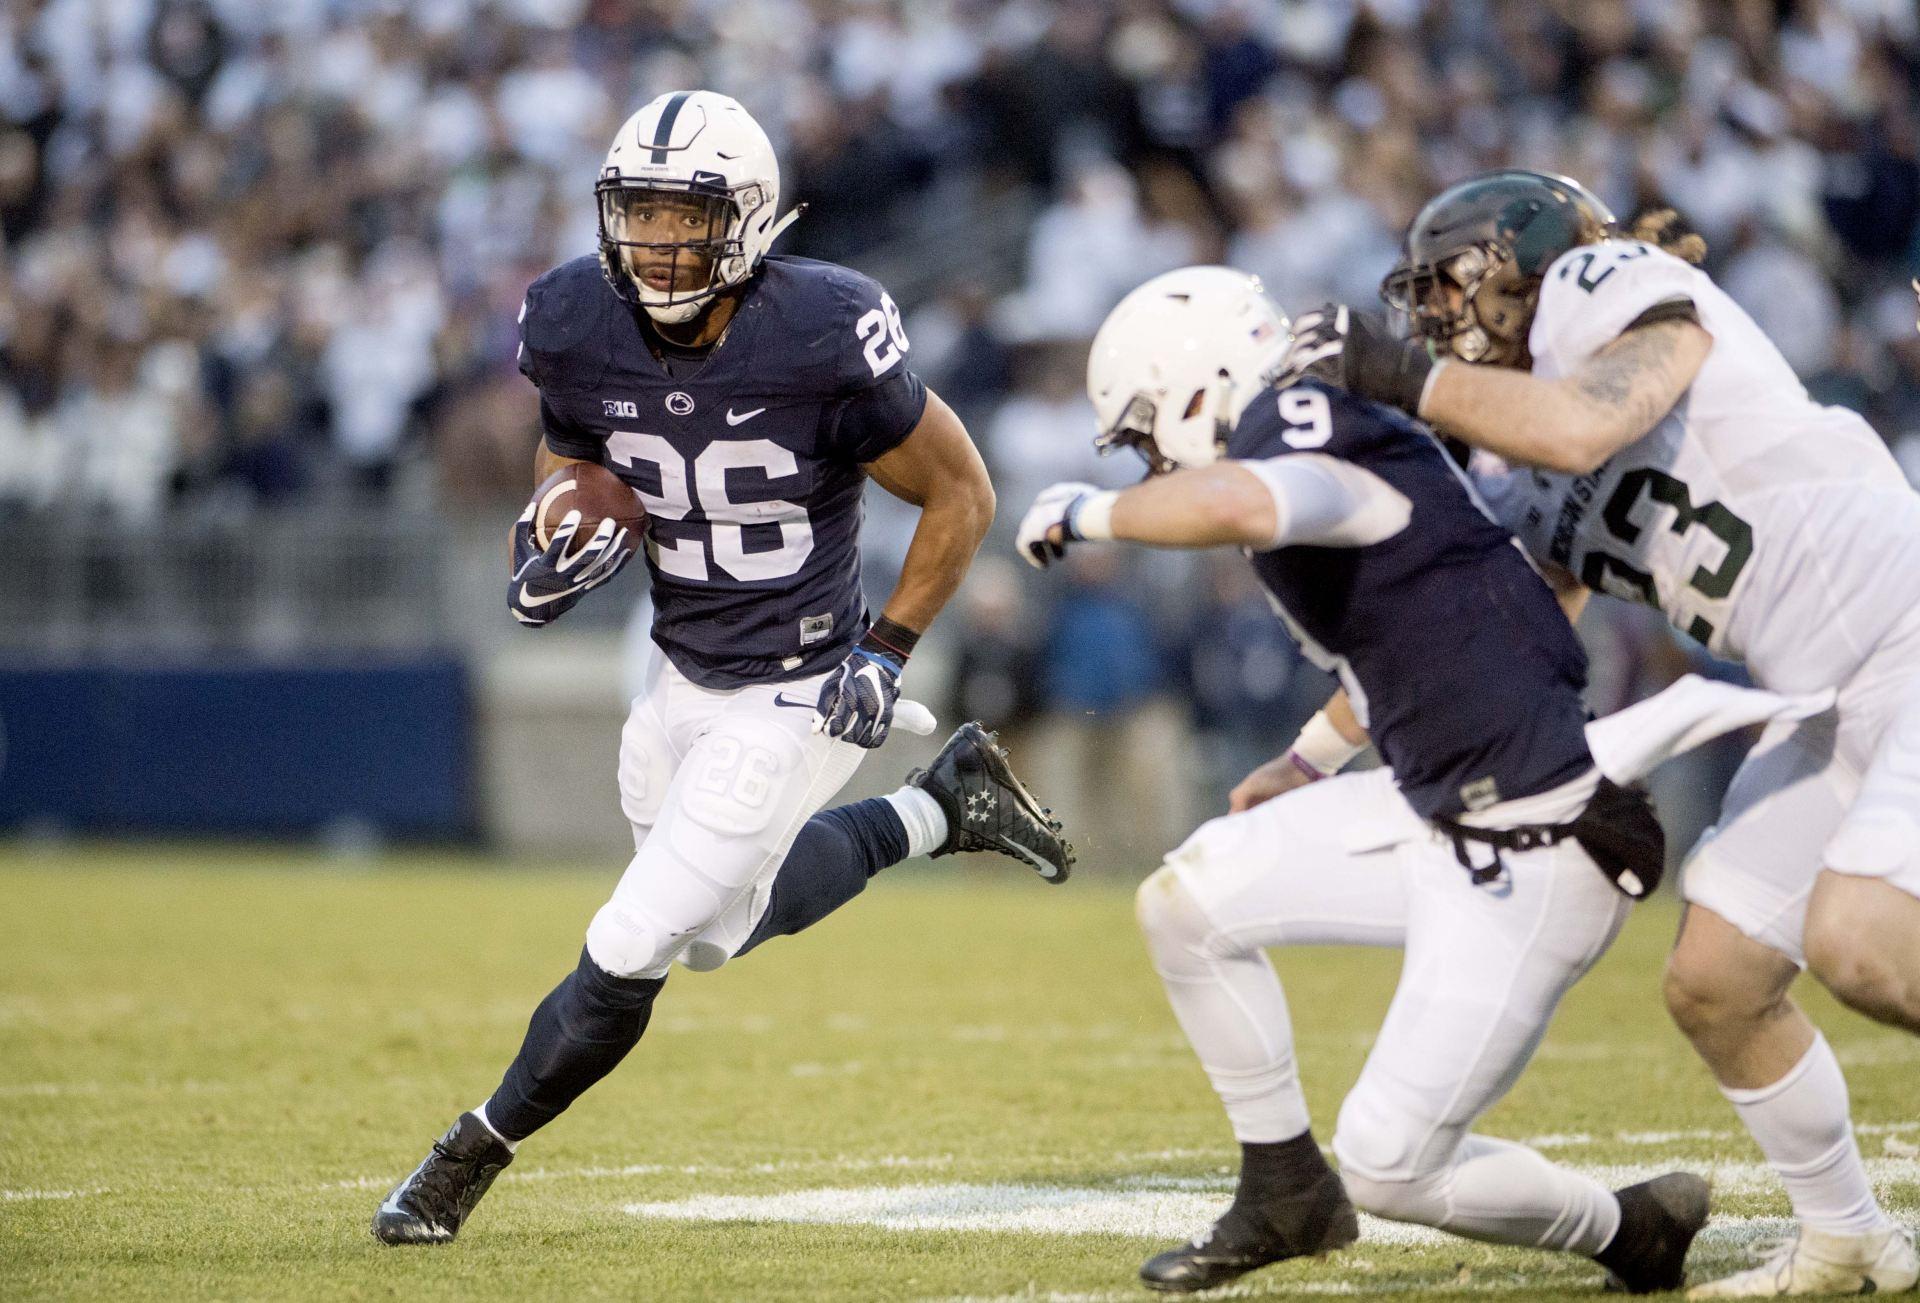 Penn State running back Saquon Barkley (26) runs down the field with the  ball as quarterback Trace McSorley (9) blocks Michigan State linebacker  Chris Frey ... 437446651